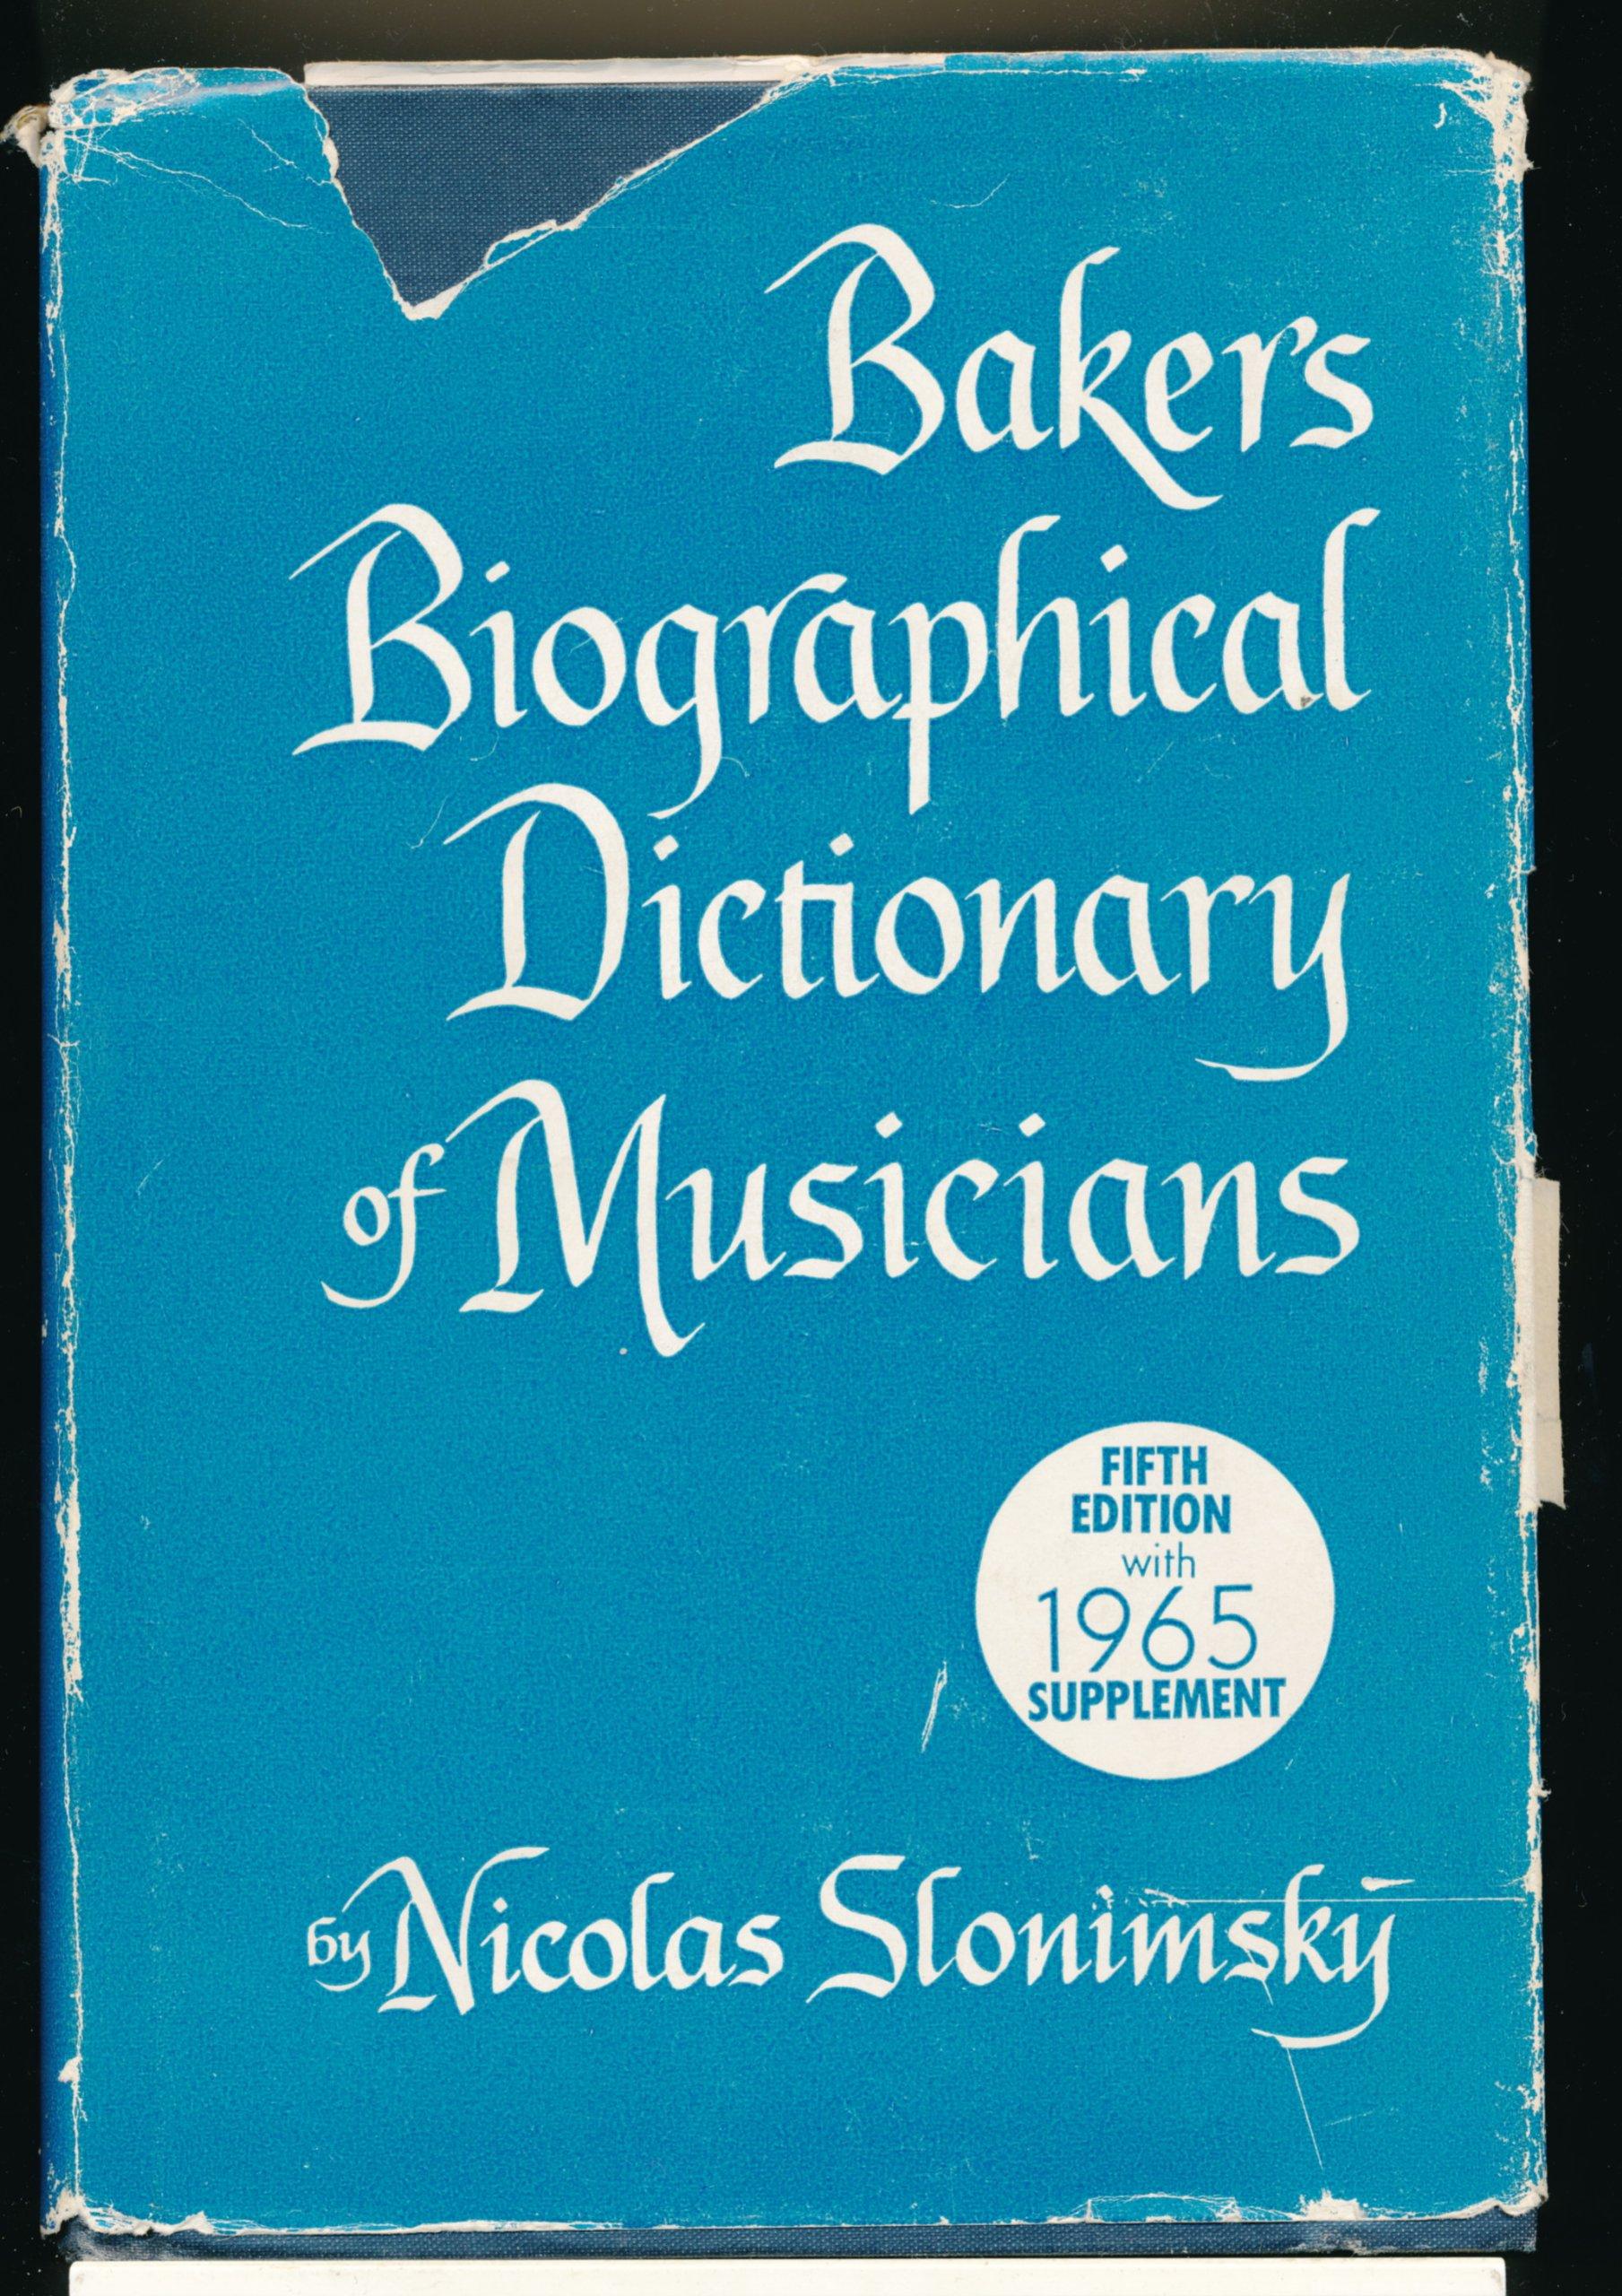 Baker's Biographical Dictionary of Musicians 1965 Supplement: Nicolas  Slonimsky: Amazon.com: Books